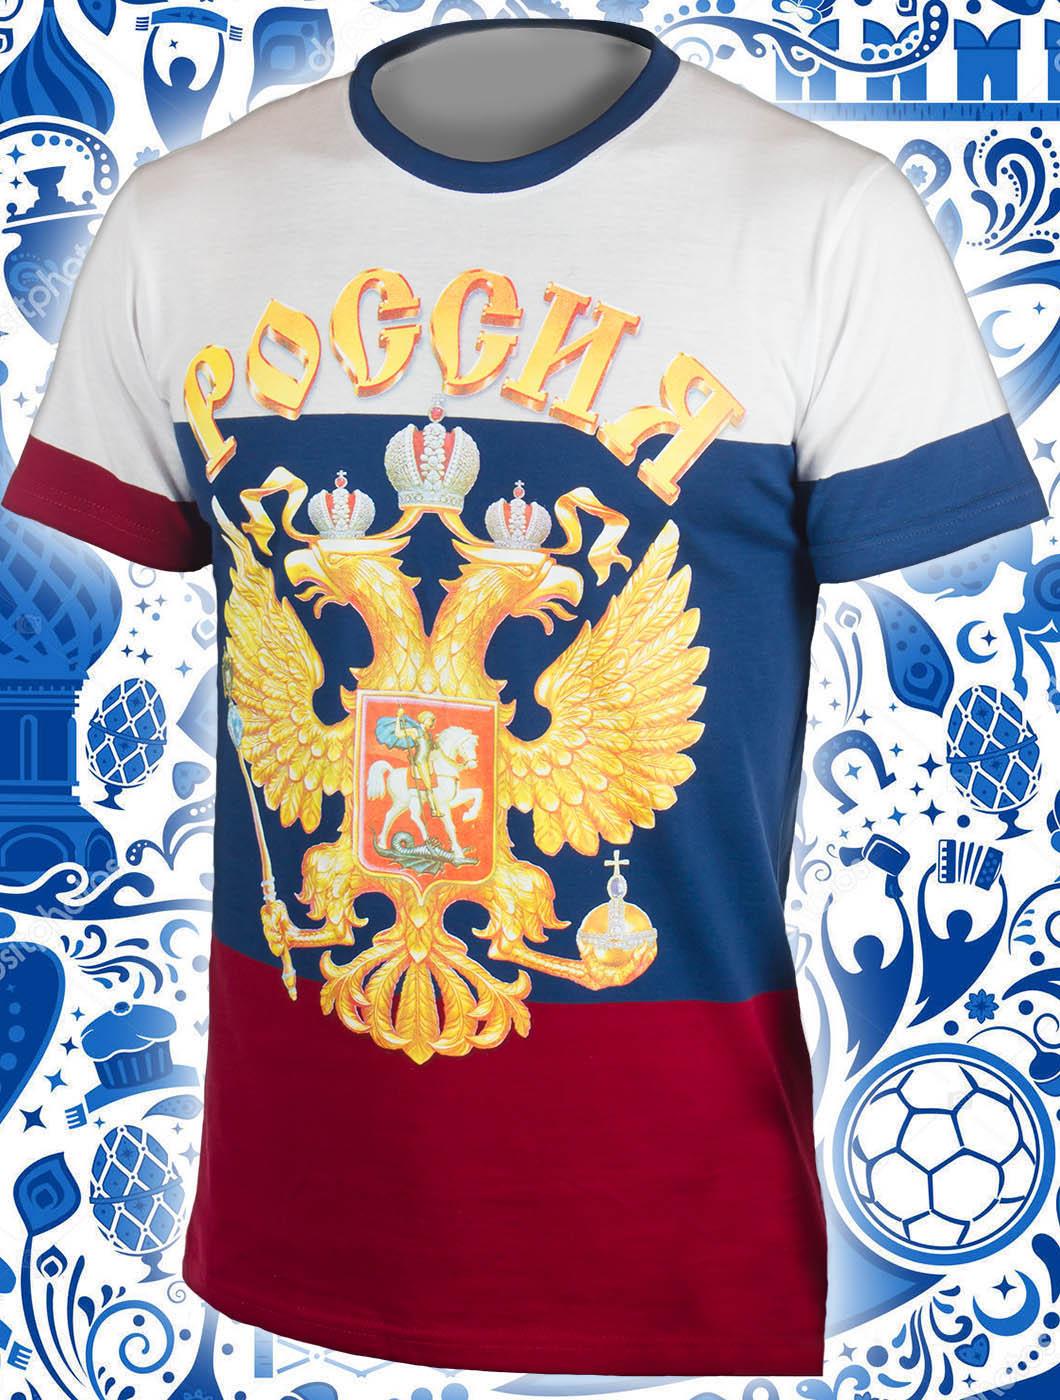 "Футболка ""From Russia with love"" лучший сувенир с России"